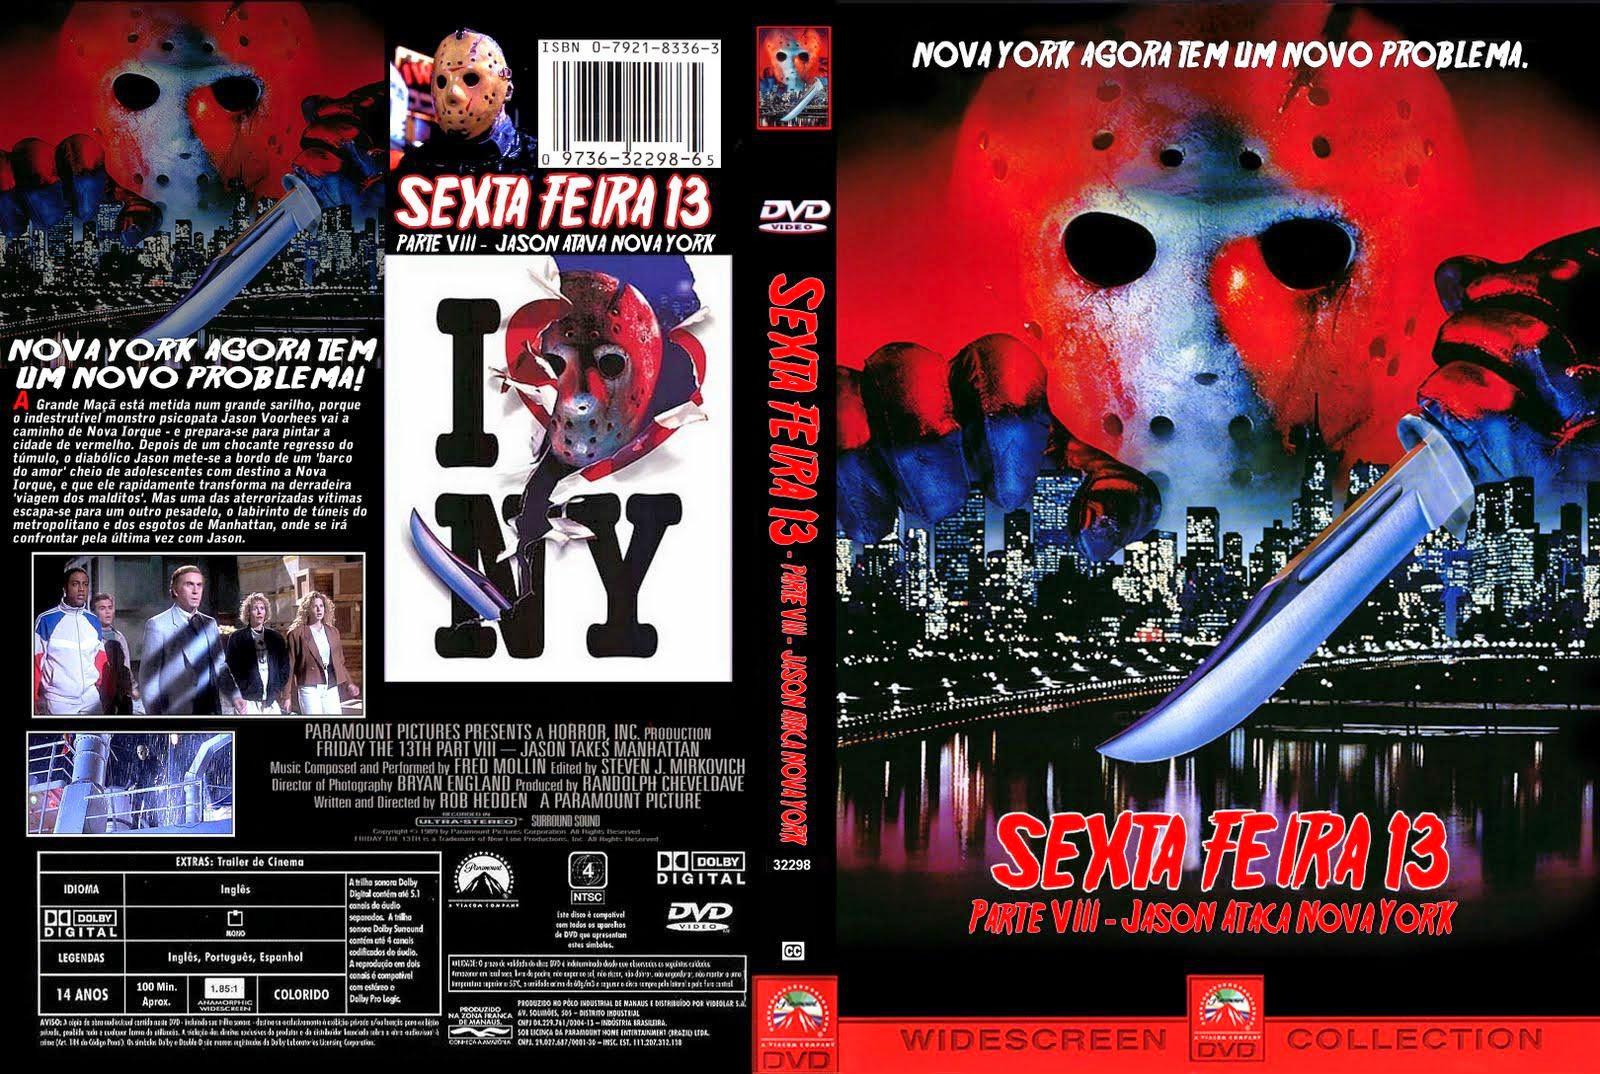 Sexta-Feira 13 Parte 8 - Jason Ataca Nova York DVD Capa